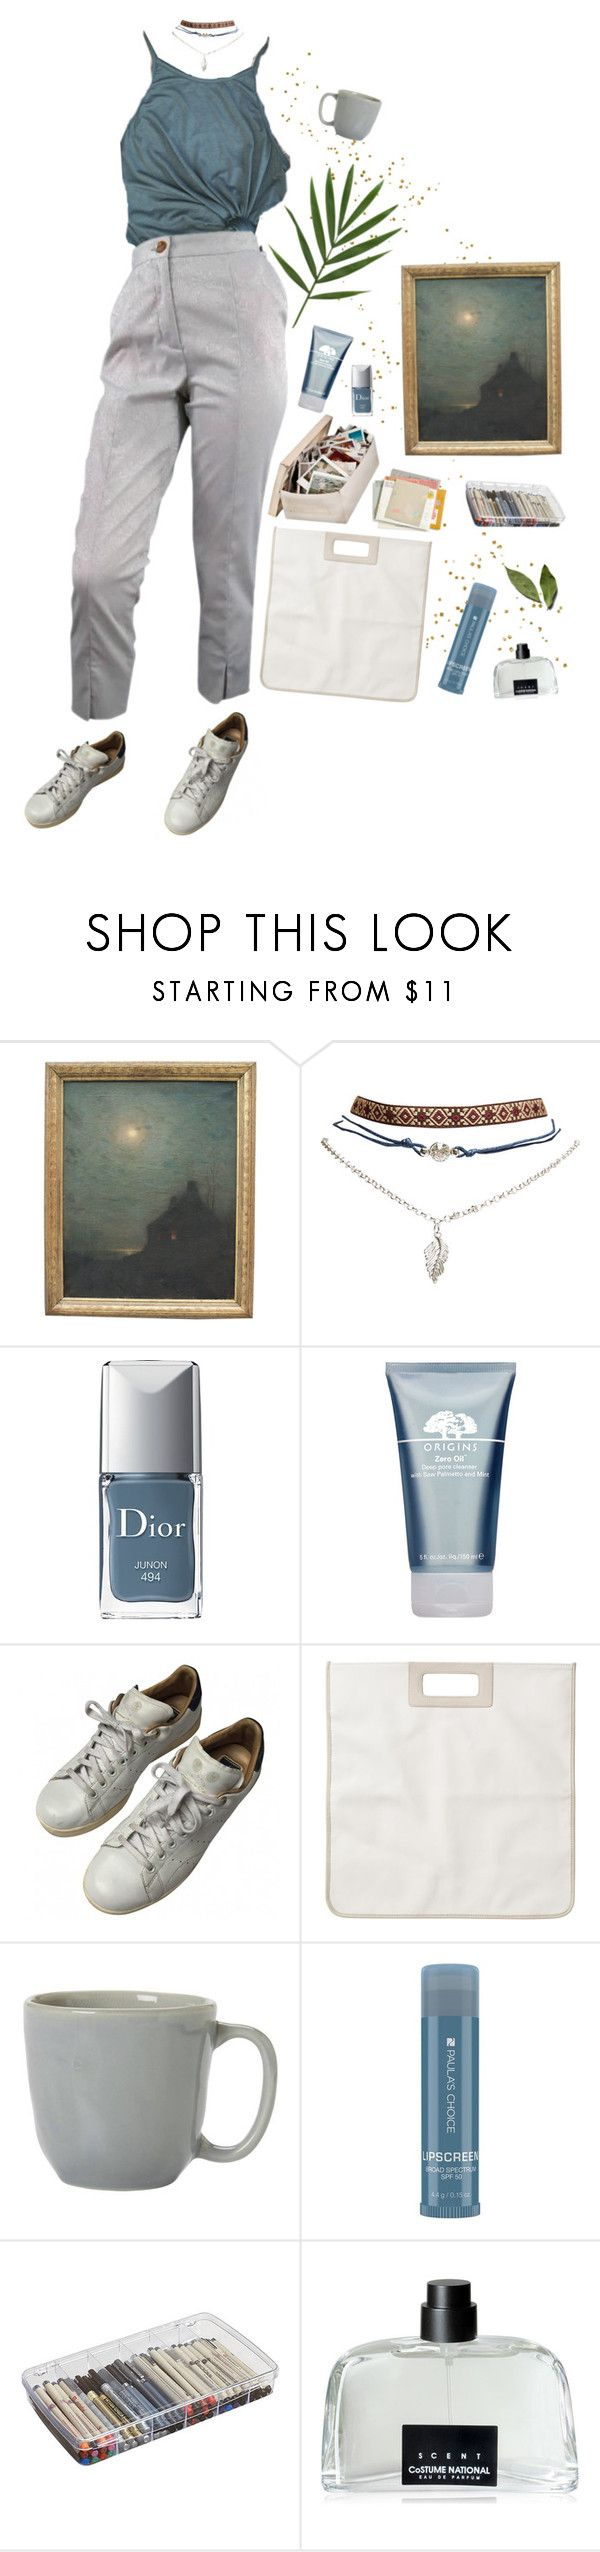 """19th Century"" by lsaroskyl ❤ liked on Polyvore featuring HARRISON, Wet Seal, Christian Dior, Origins, adidas, Monki, Juliska, Paula's Choice, ArtBin and COSTUME NATIONAL"